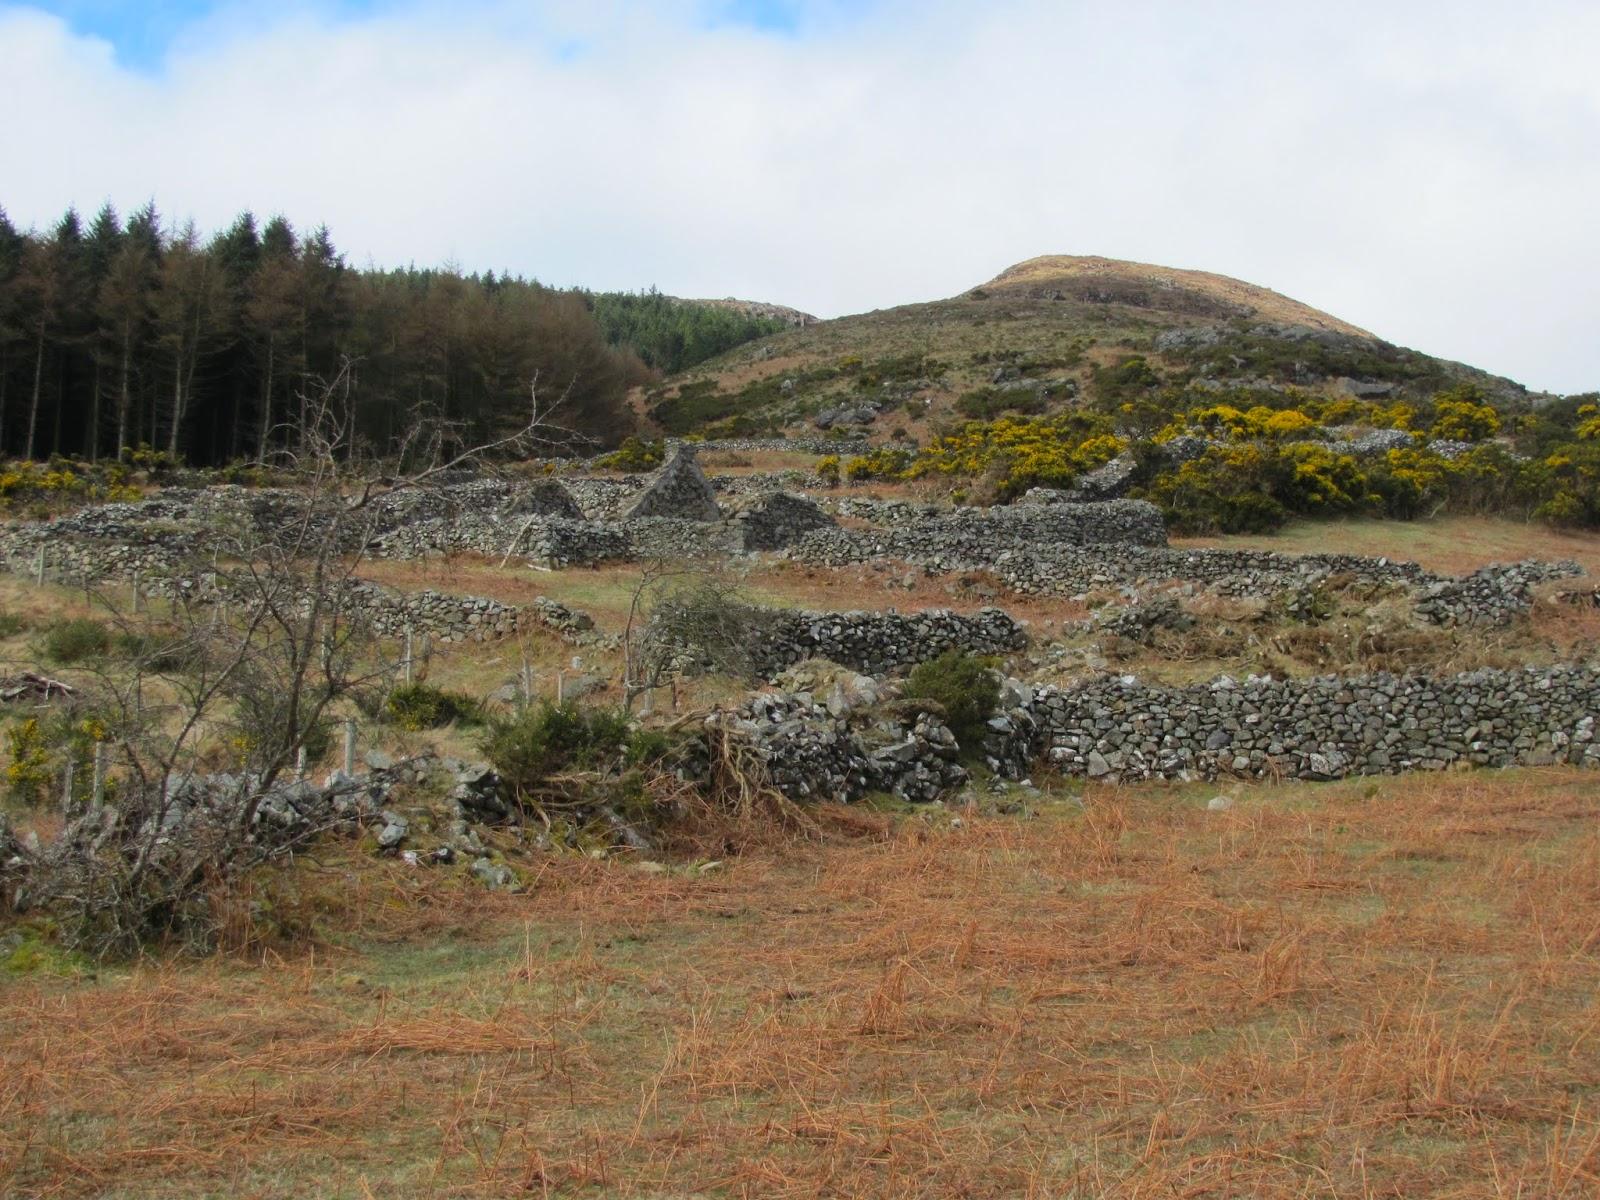 Tain Mountain Co. Louth Ireland